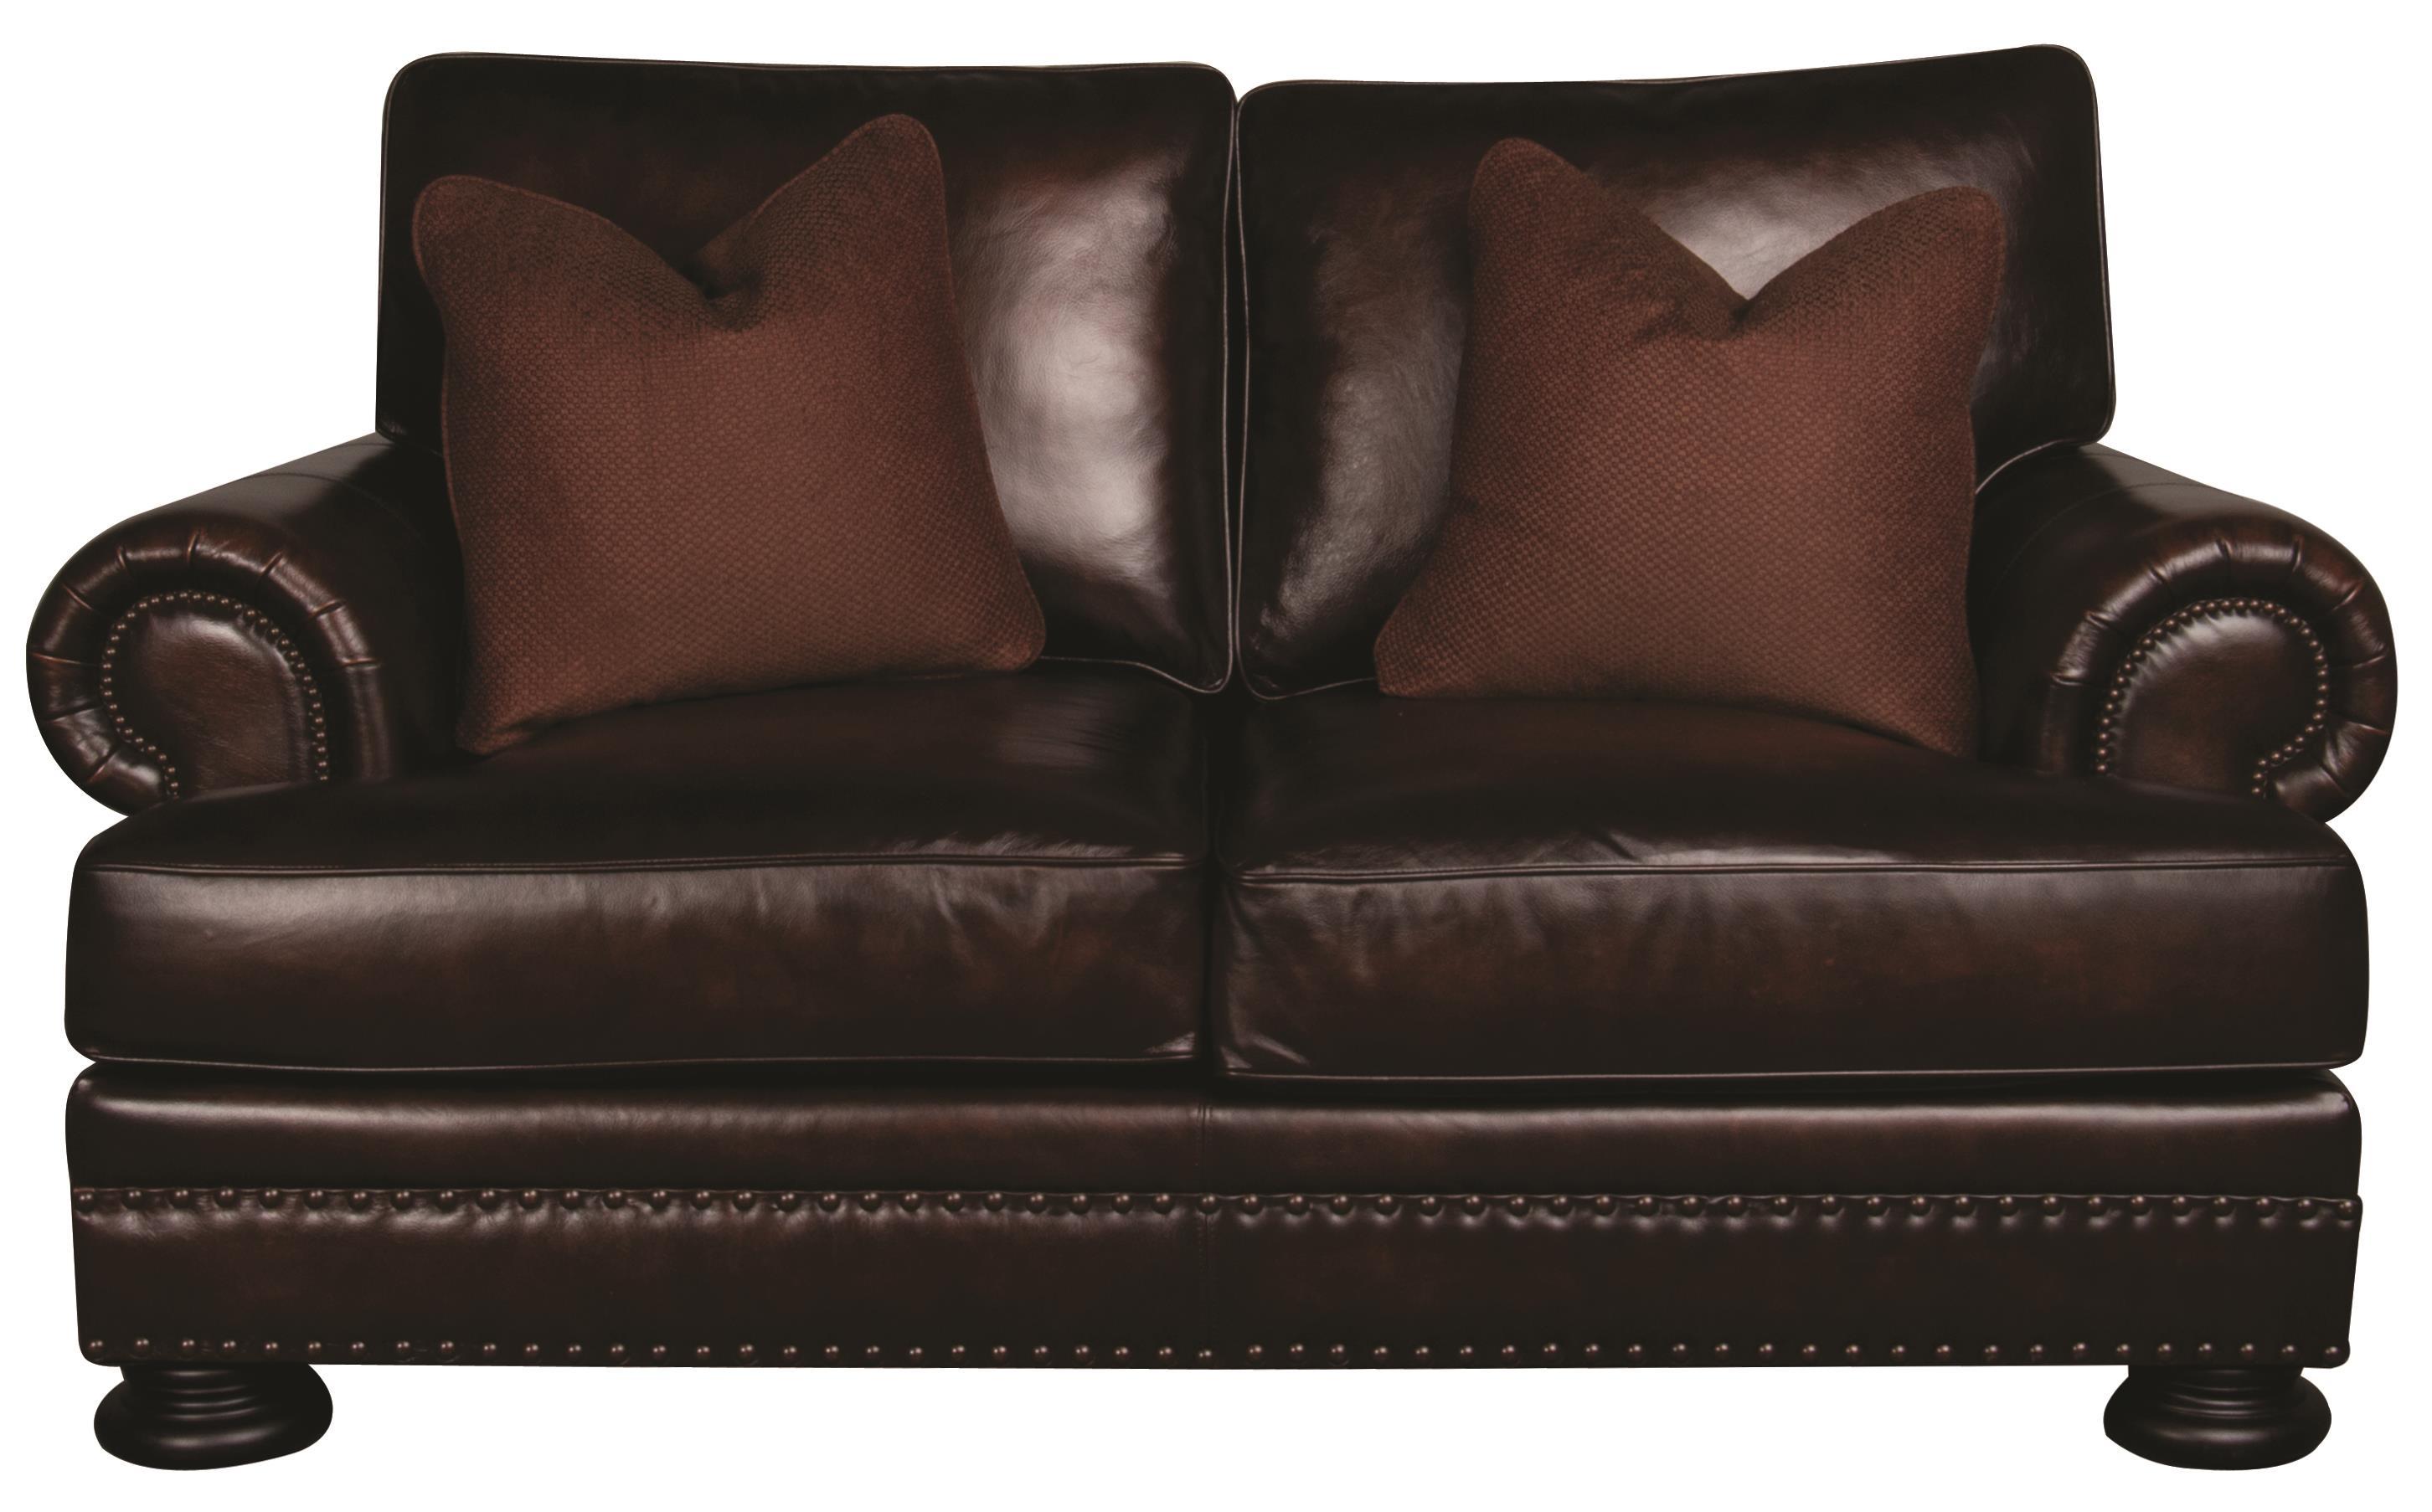 Bernhardt Foster Foster Leather Loveseat - Item Number: 685933074